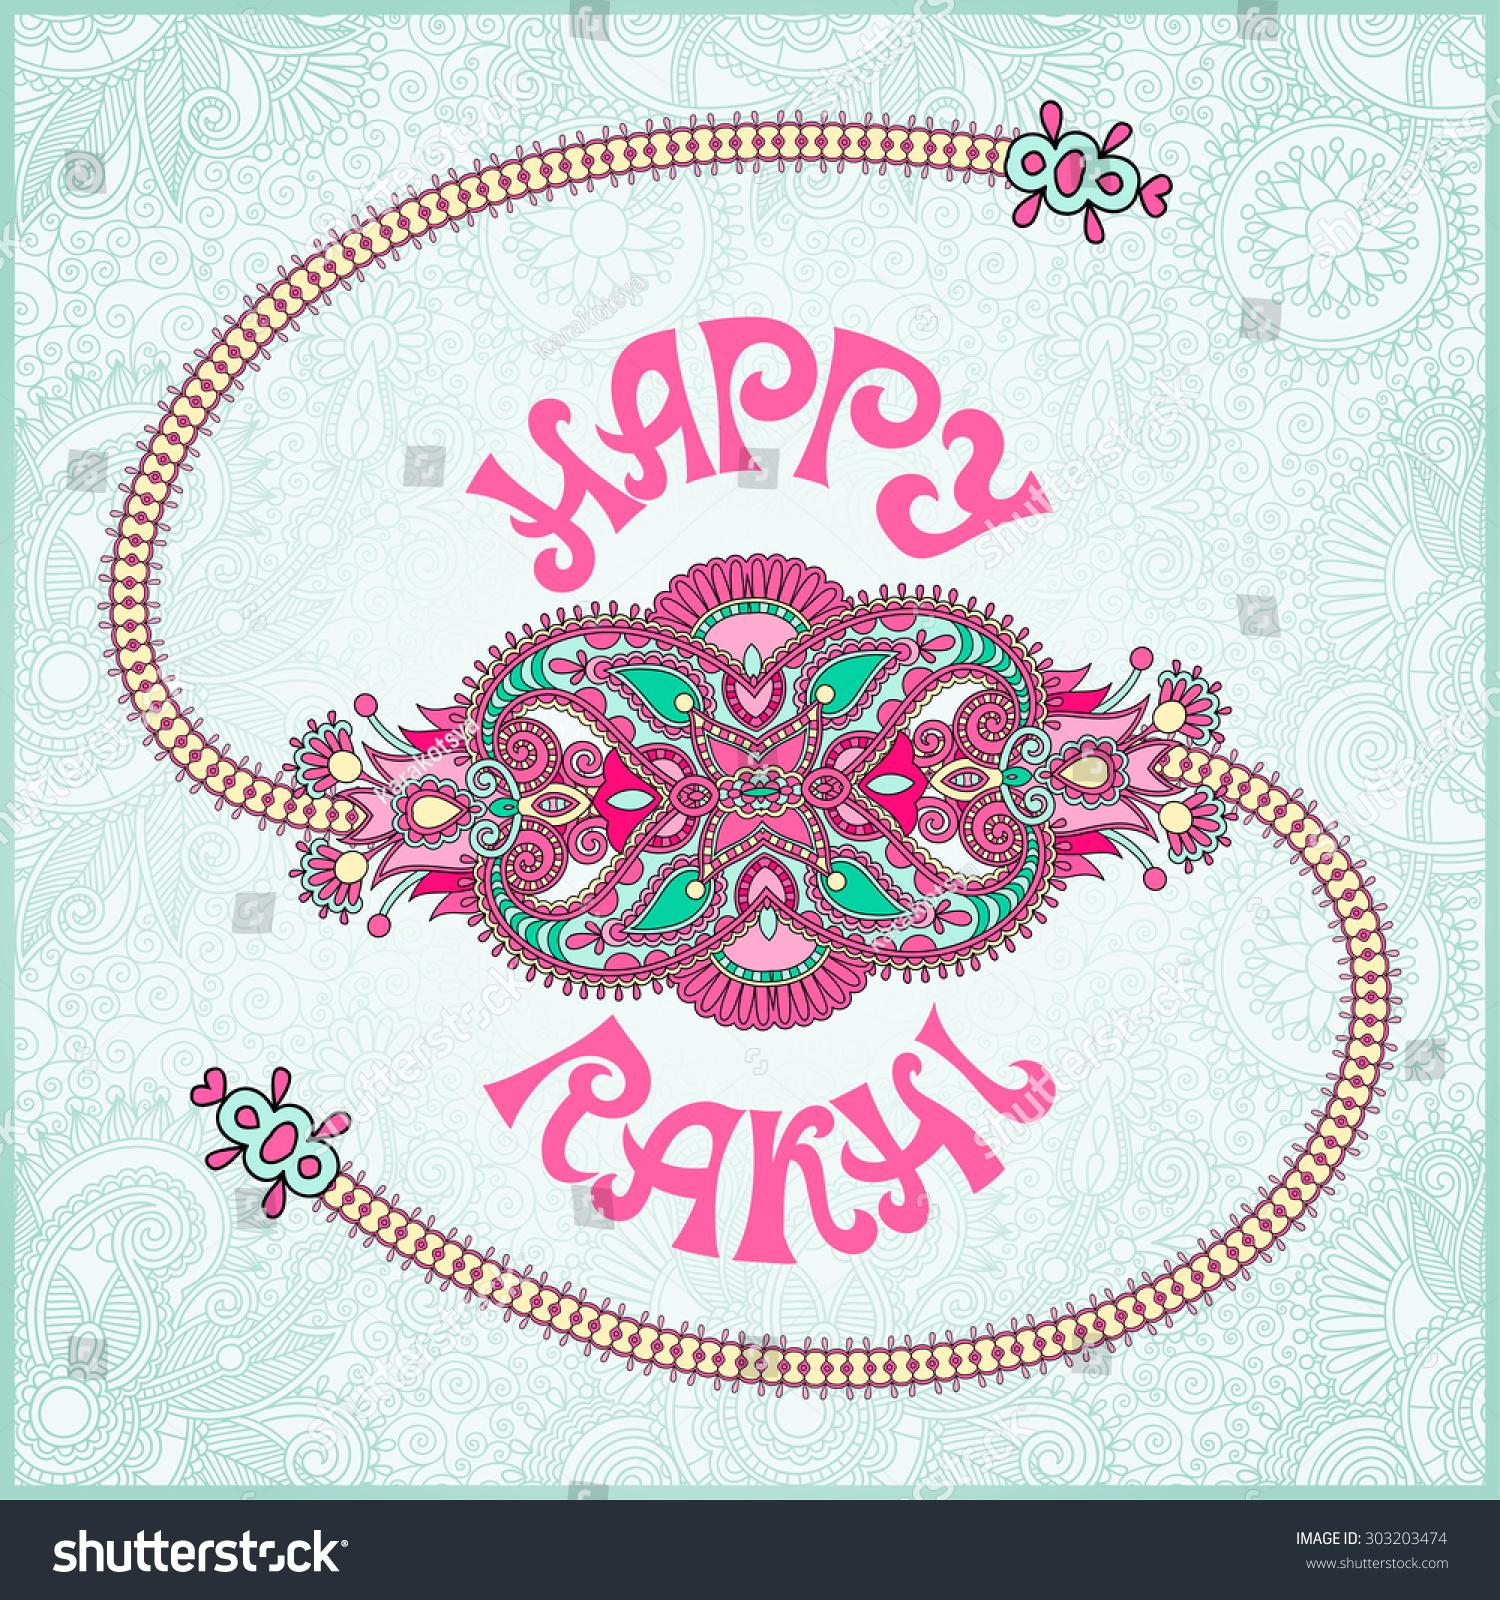 Happy rakhi greeting card indian holiday stock illustration happy rakhi greeting card for indian holiday raksha bandhan with original ornamental bangle on floral light kristyandbryce Choice Image